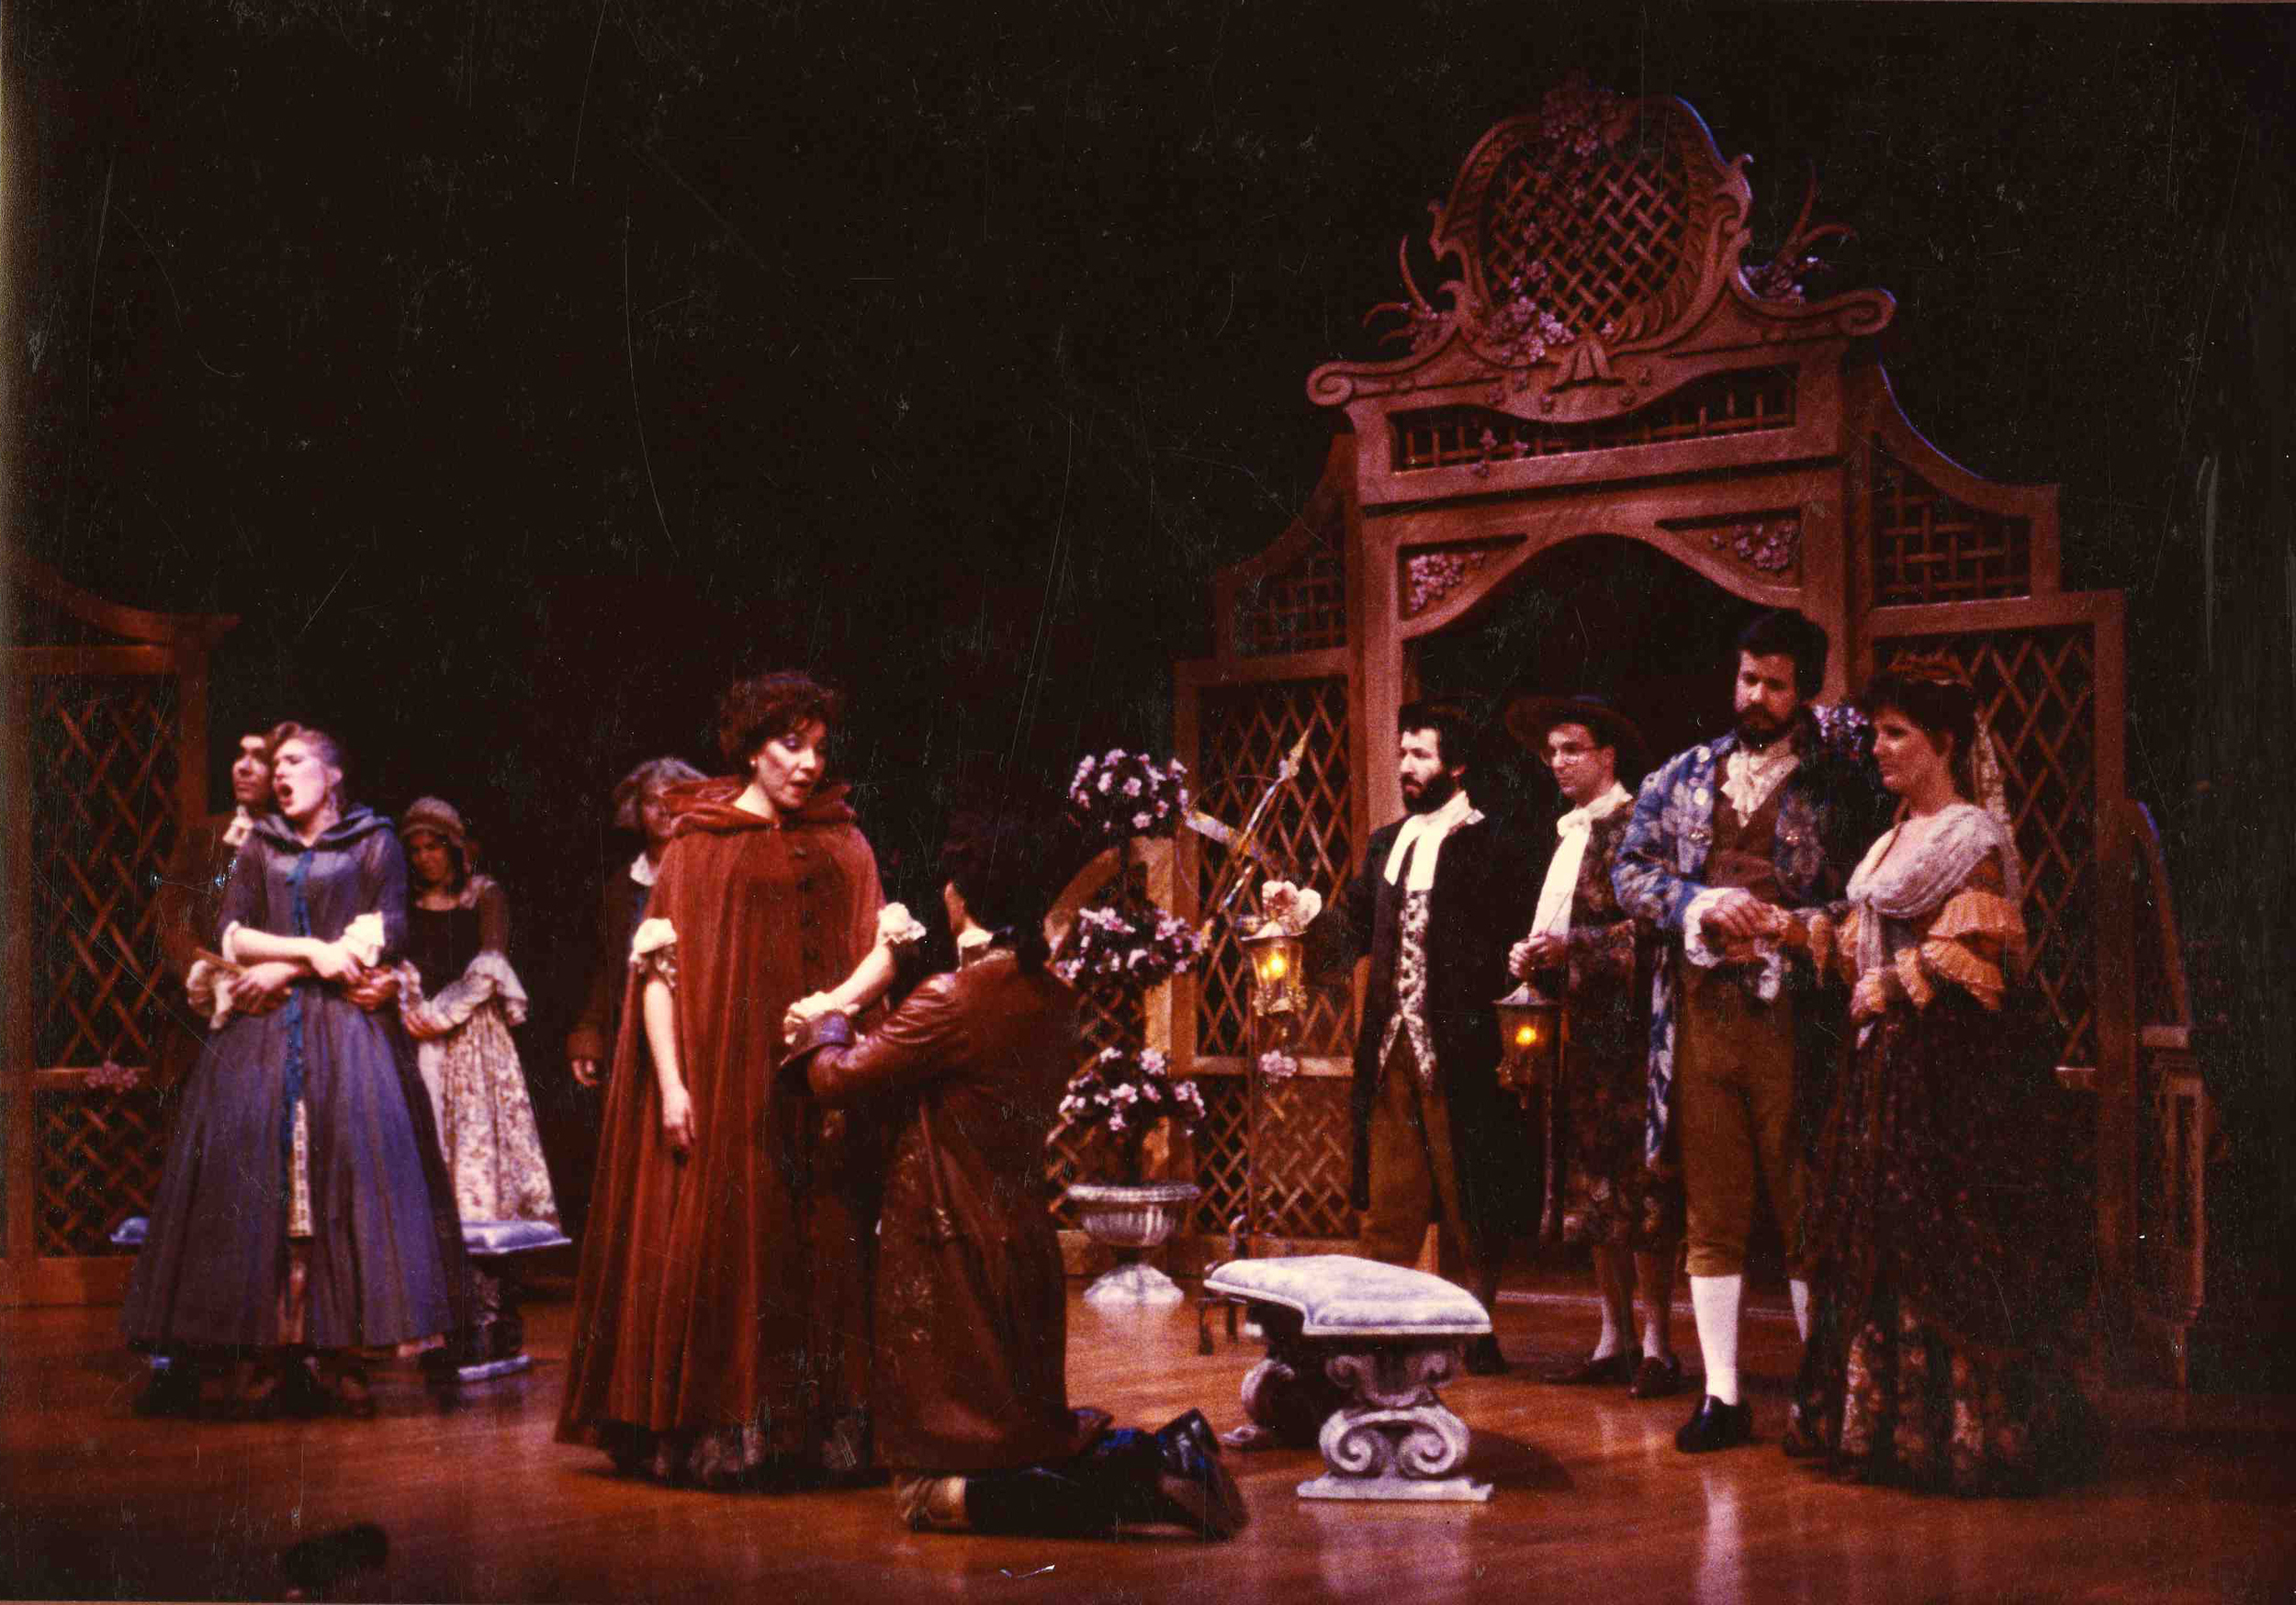 3.The Marriage of Figaro-Act IV Garden Detail-Nicholas Music Center,NJ.jpg